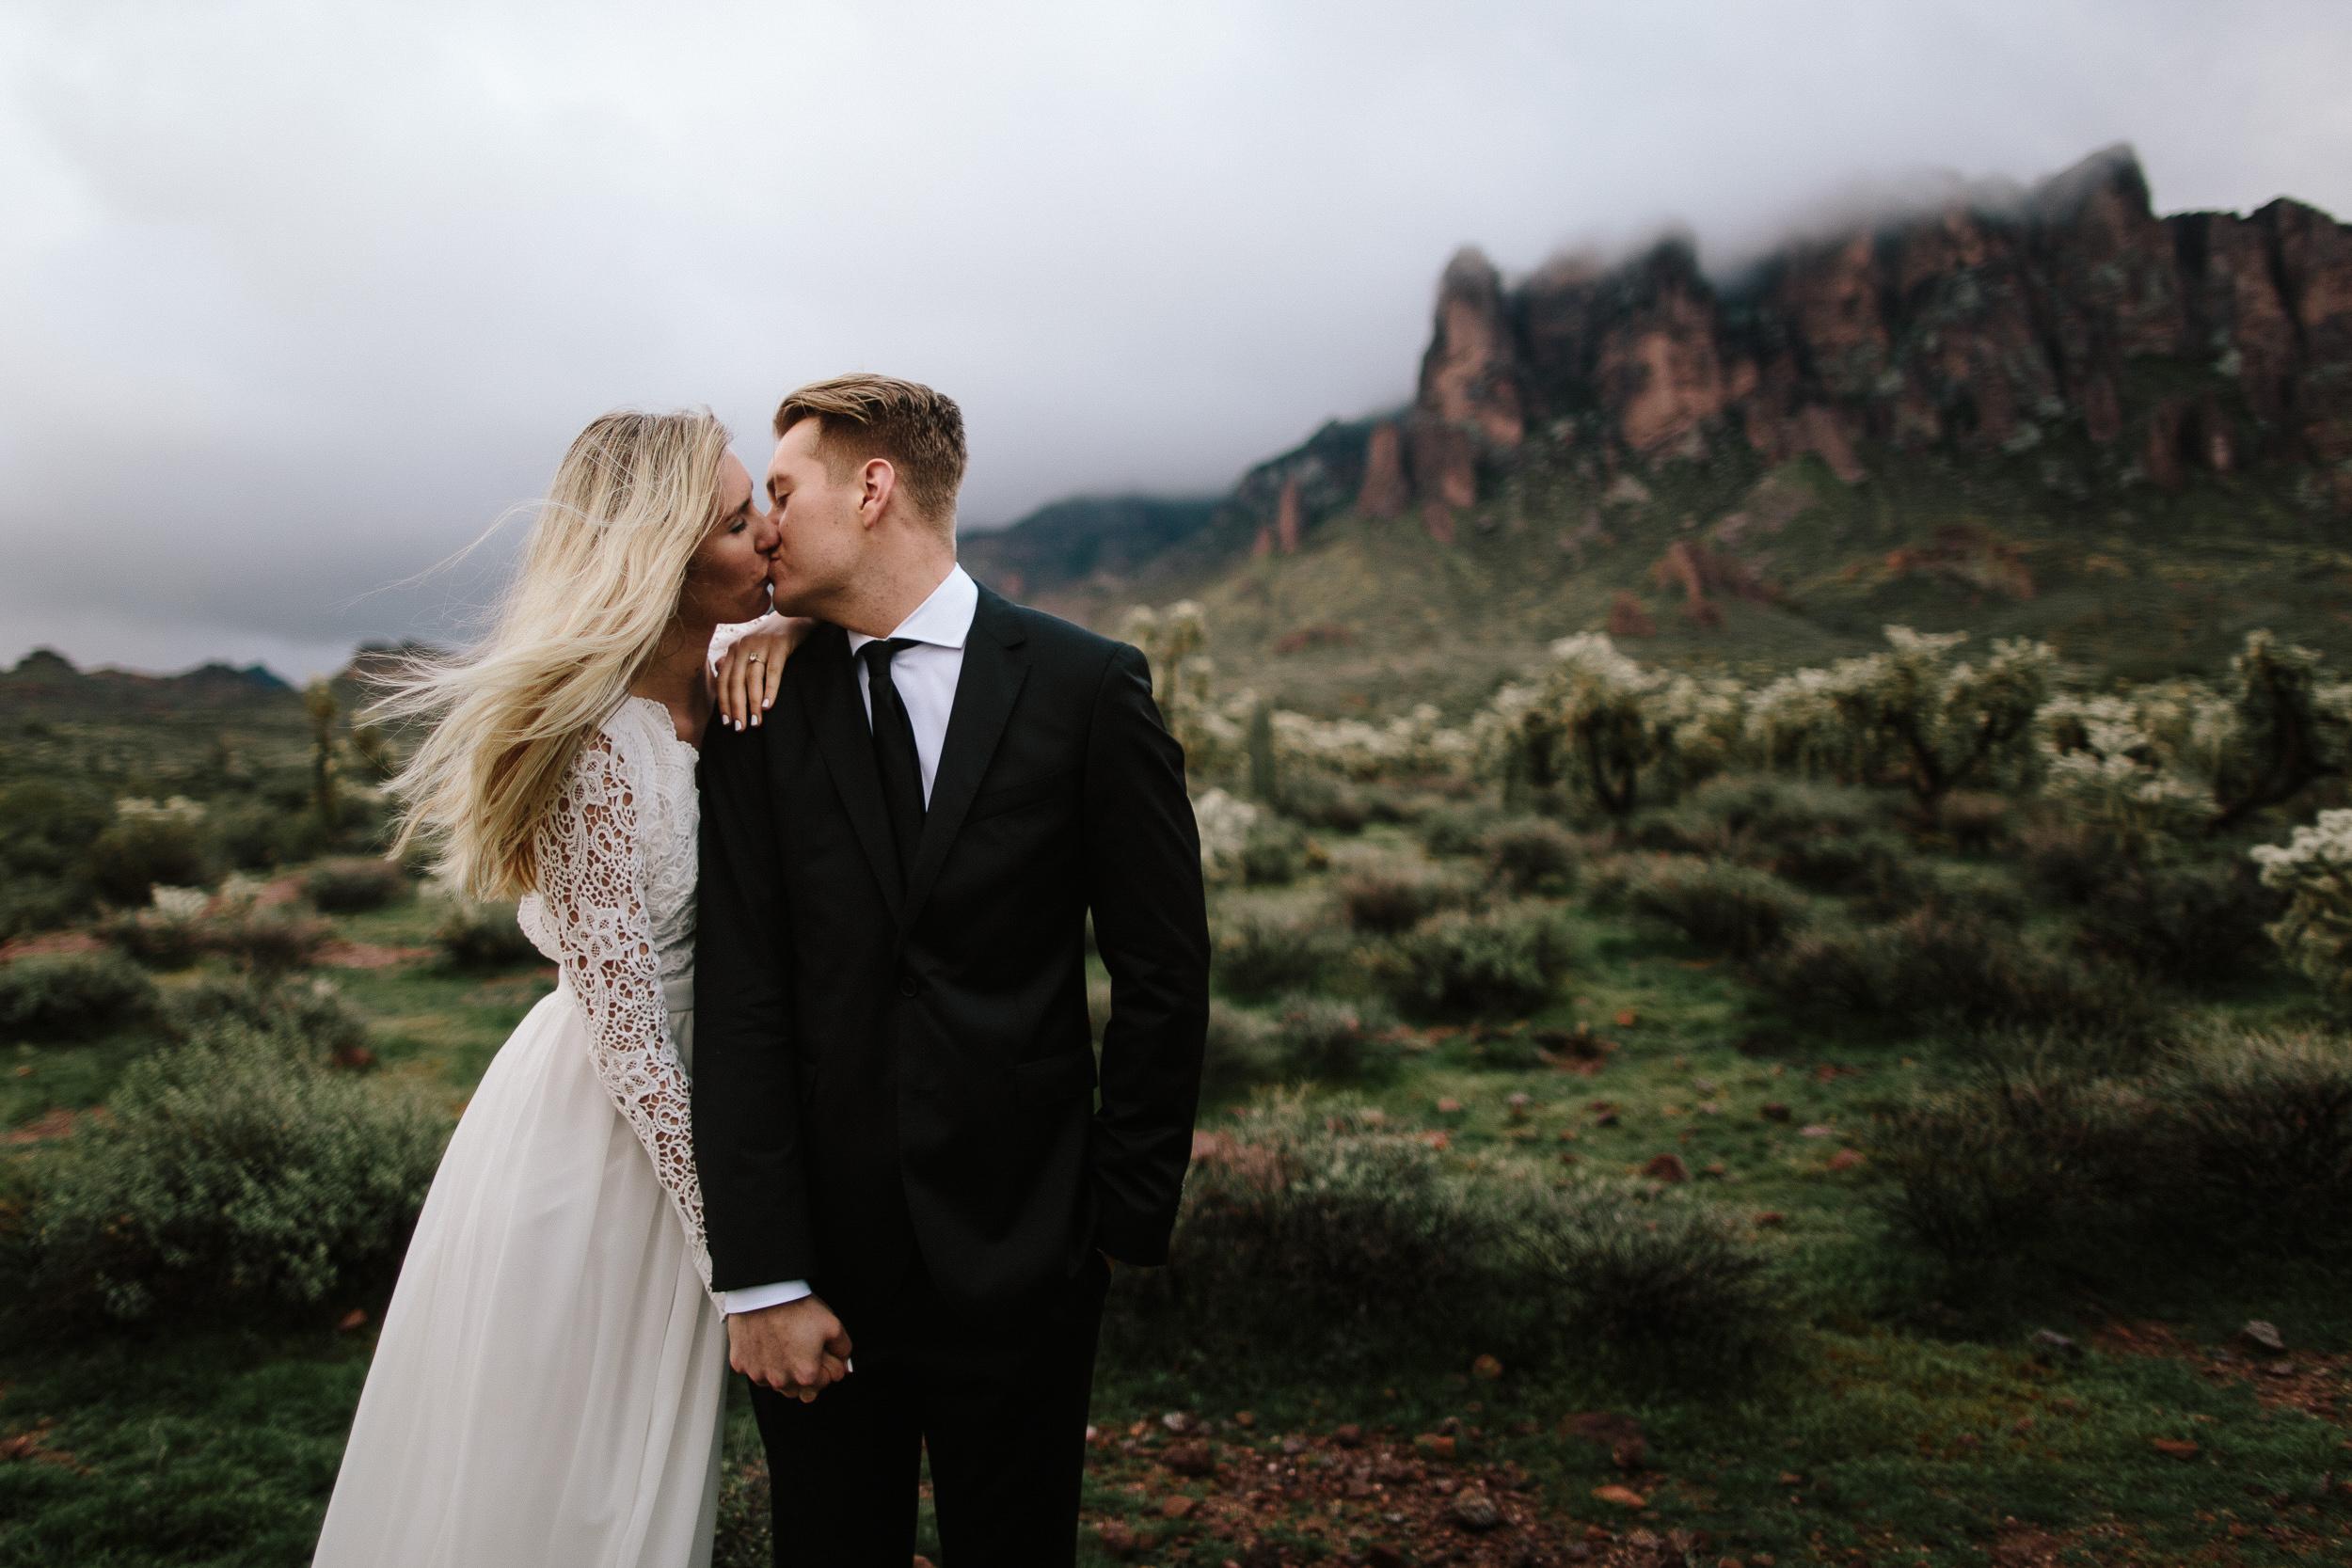 phoenix-mesa-elopement-wedding-photographer-lost-dutchman-state-park-superstitious-mountains-26.jpg